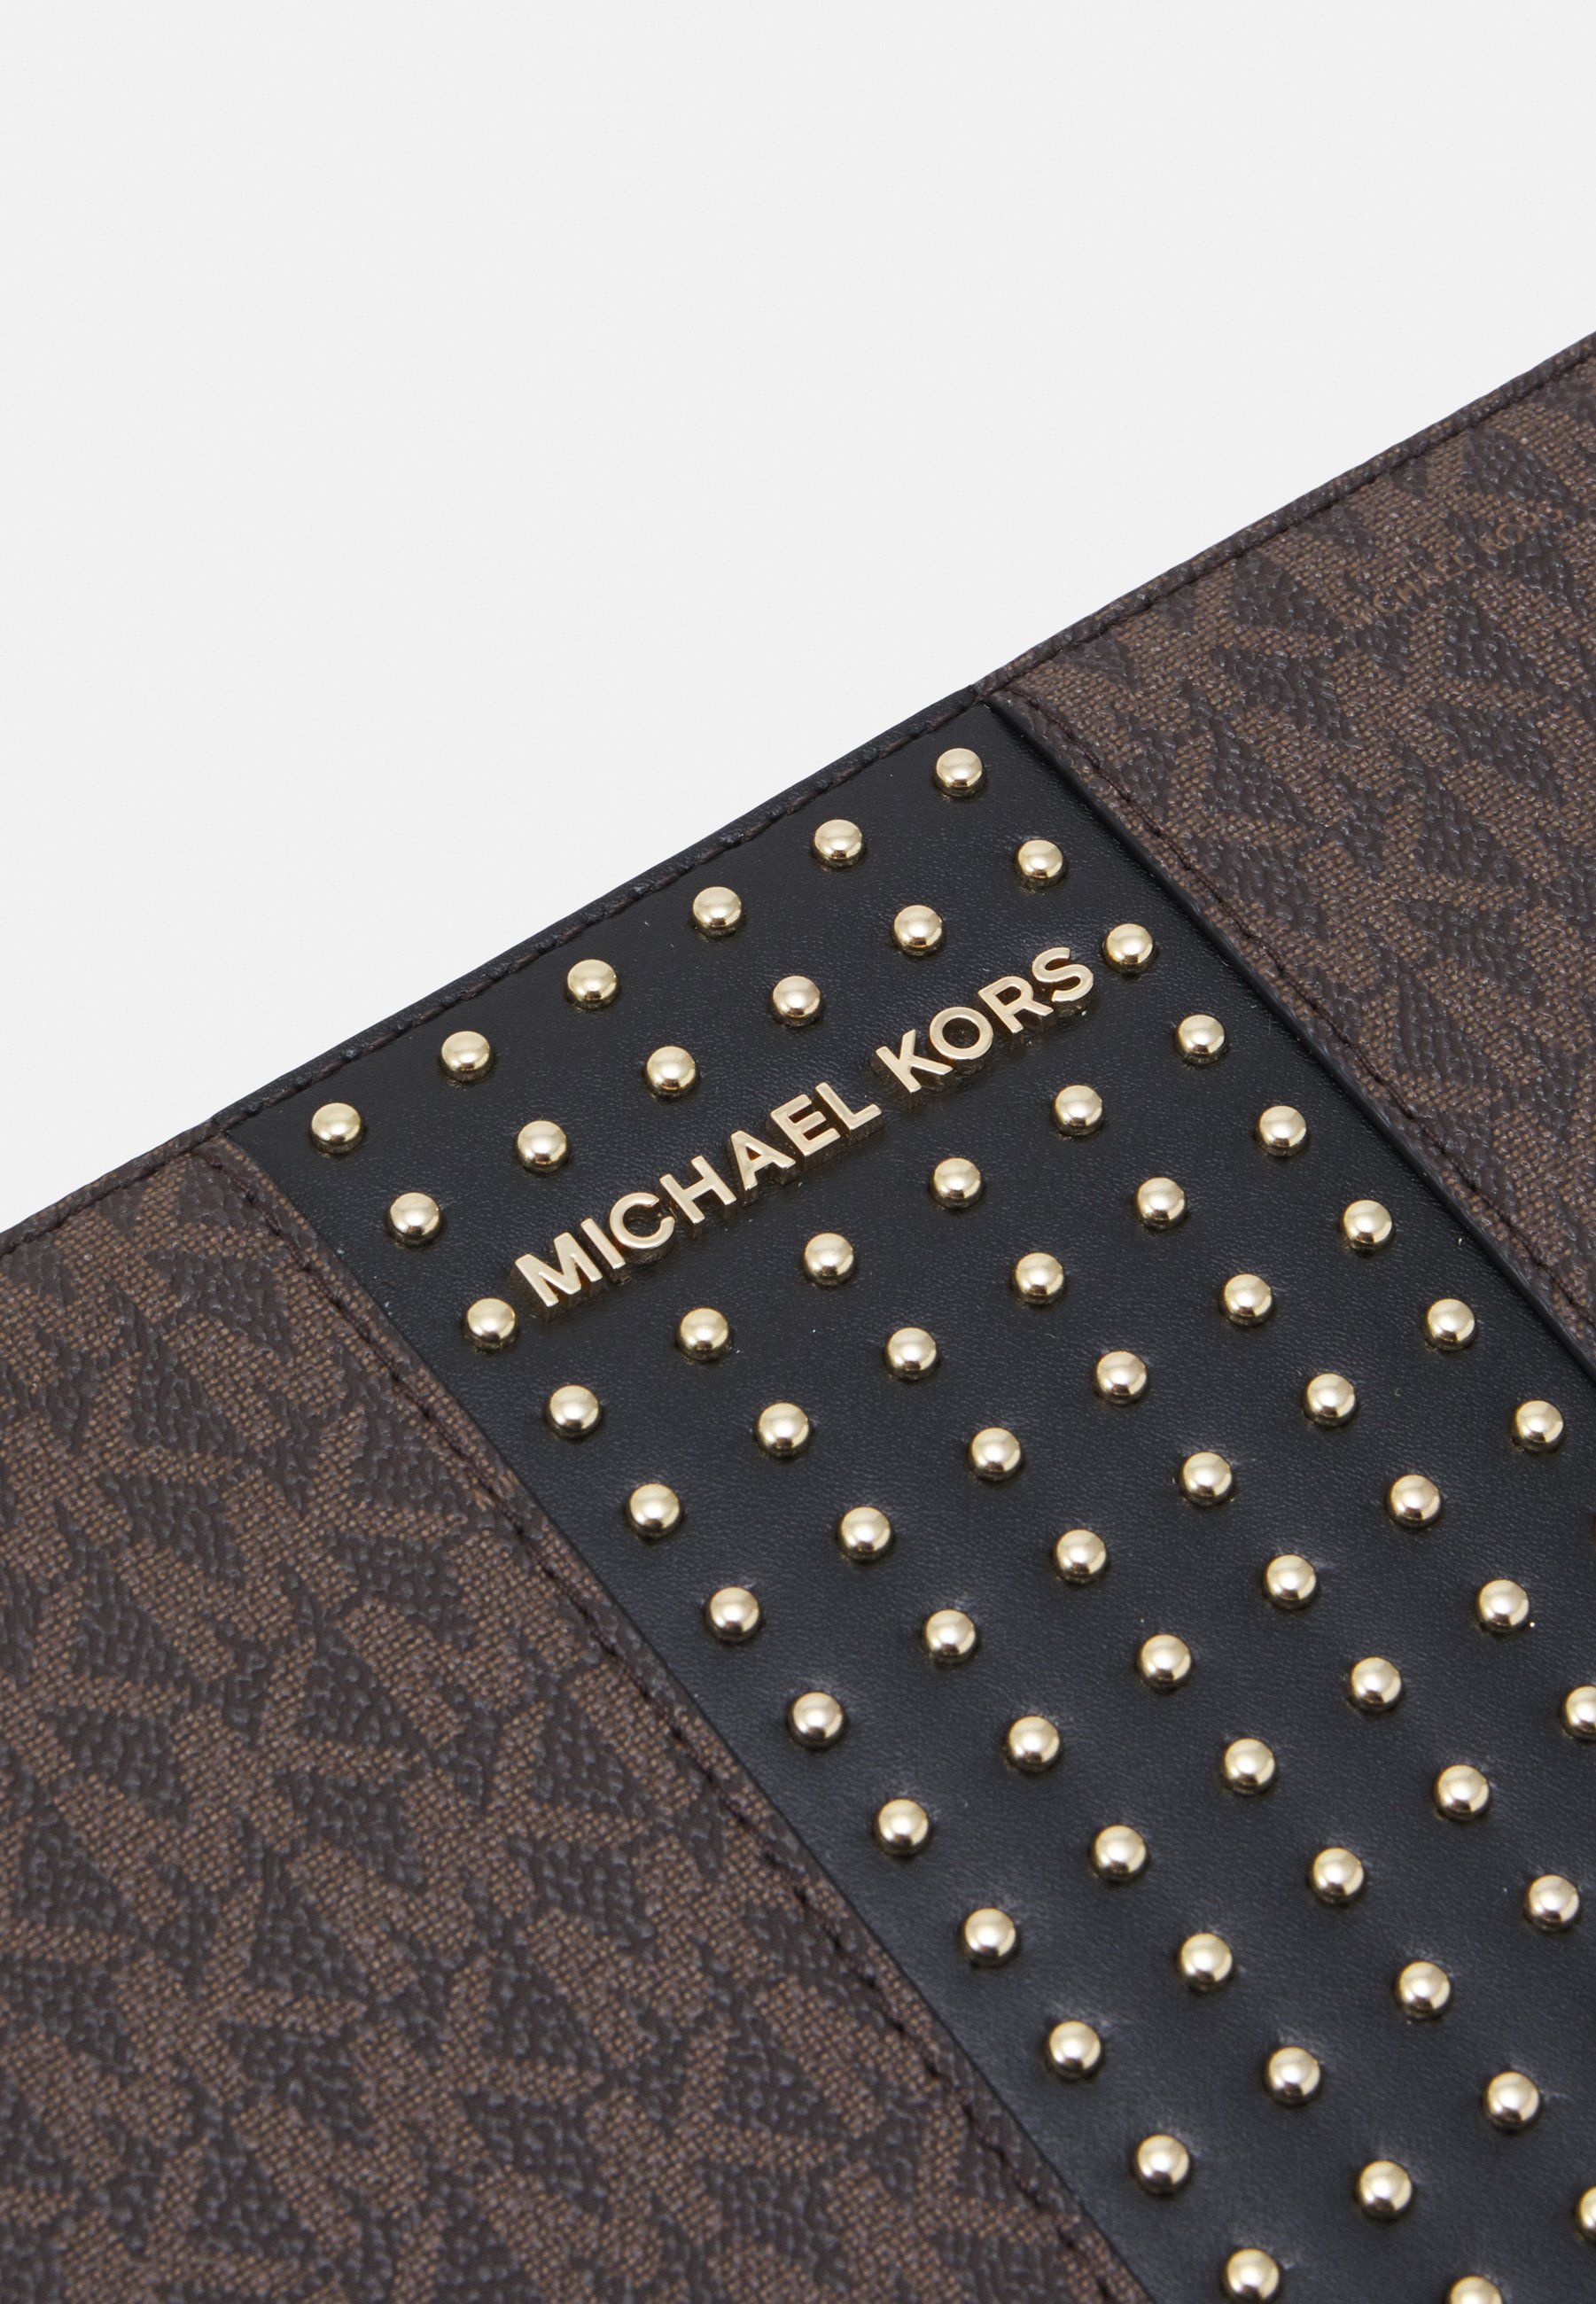 MICHAEL Michael Kors JET SETLG CROSSBODY MICROSTUDS - Skulderveske - brown/black/brun WijnuzCZV5nZnYW